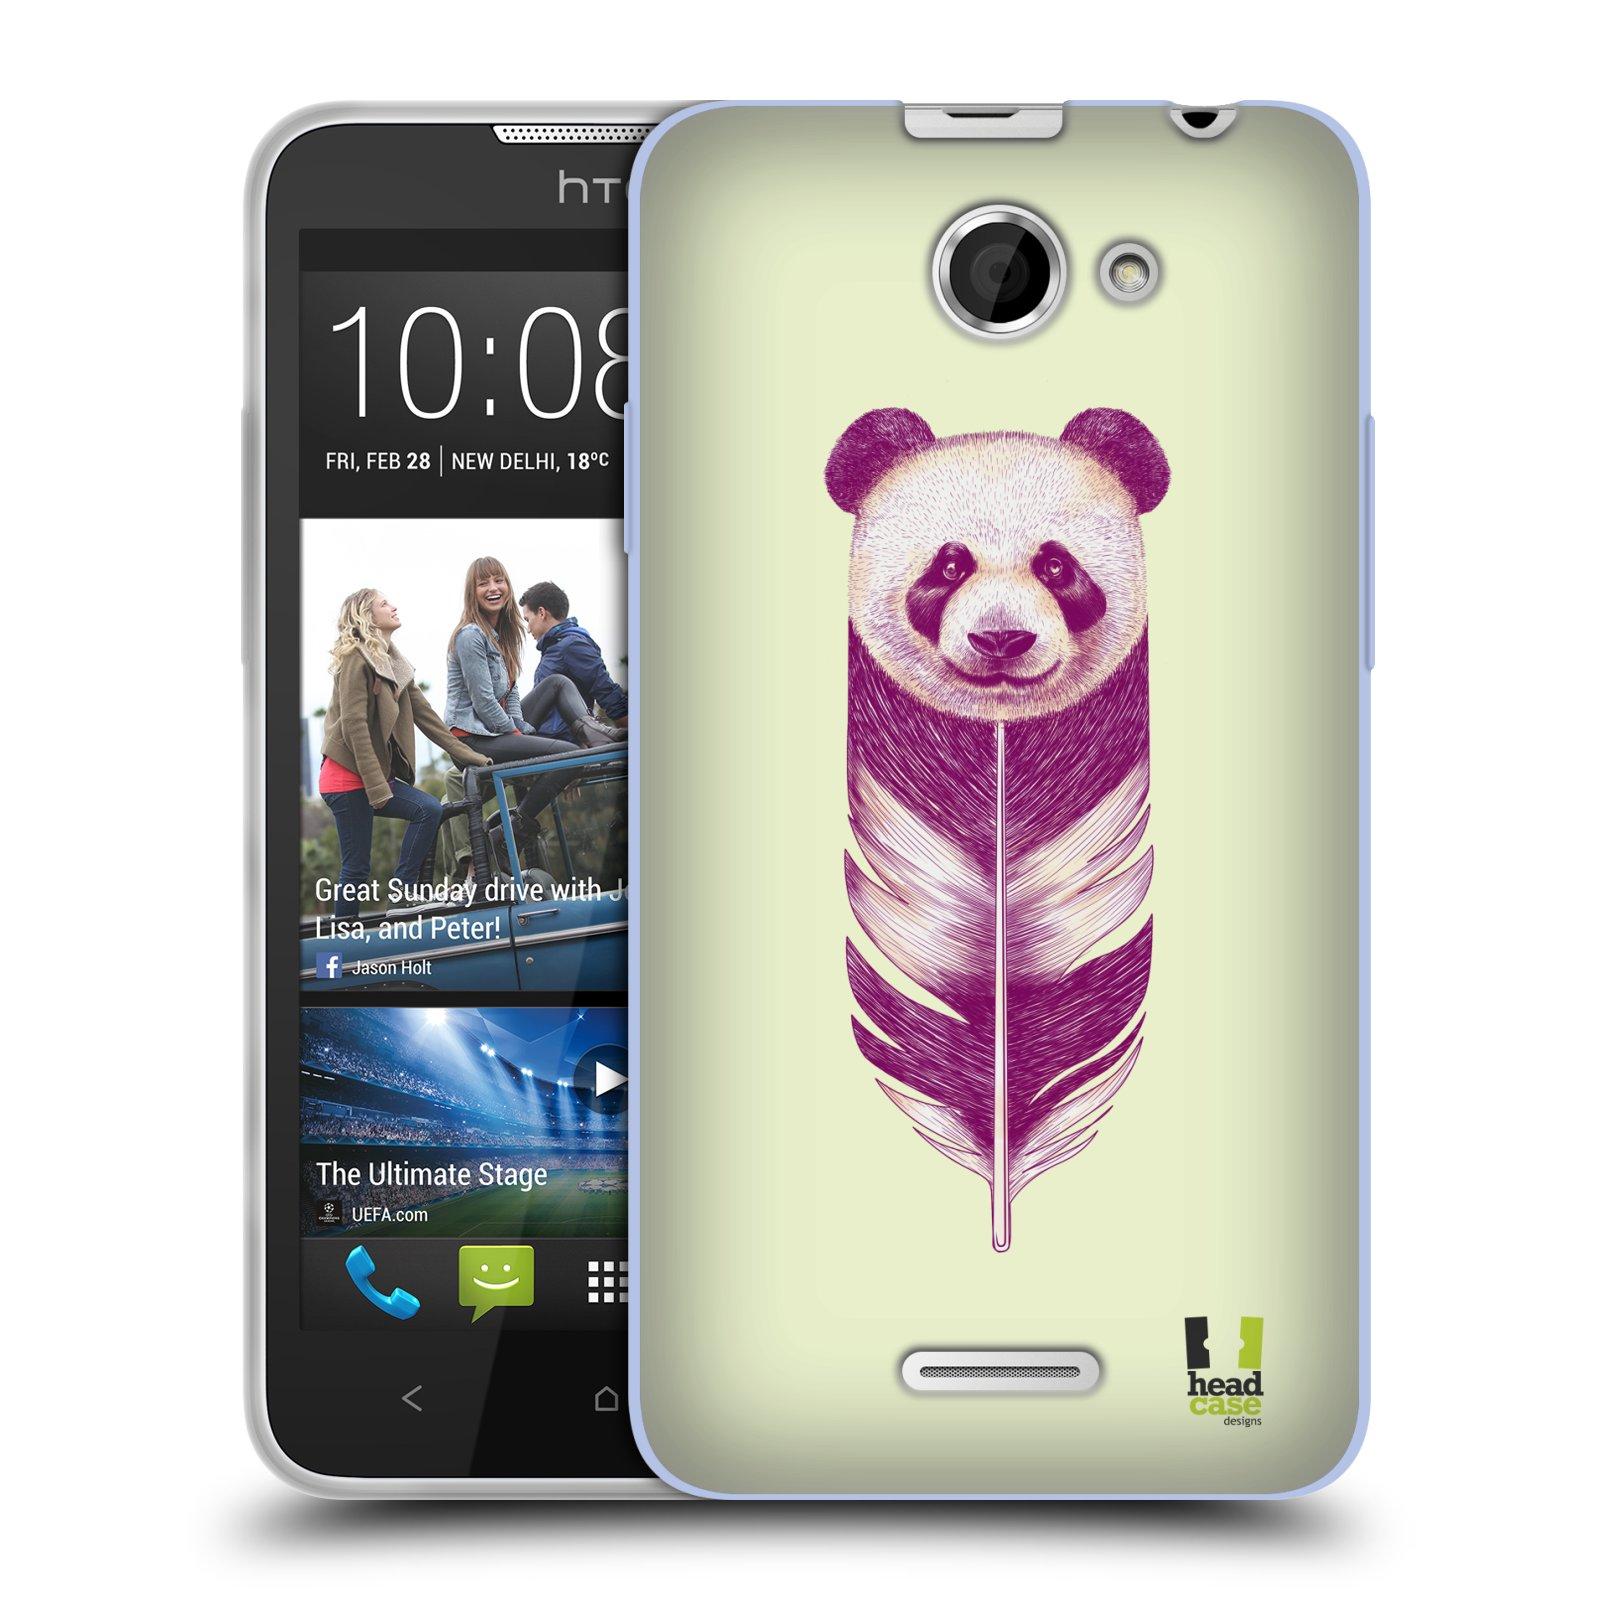 Silikonové pouzdro na mobil HTC Desire 516 HEAD CASE PÍRKO PANDA (Silikonový kryt či obal na mobilní telefon HTC Desire 516 Dual SIM)